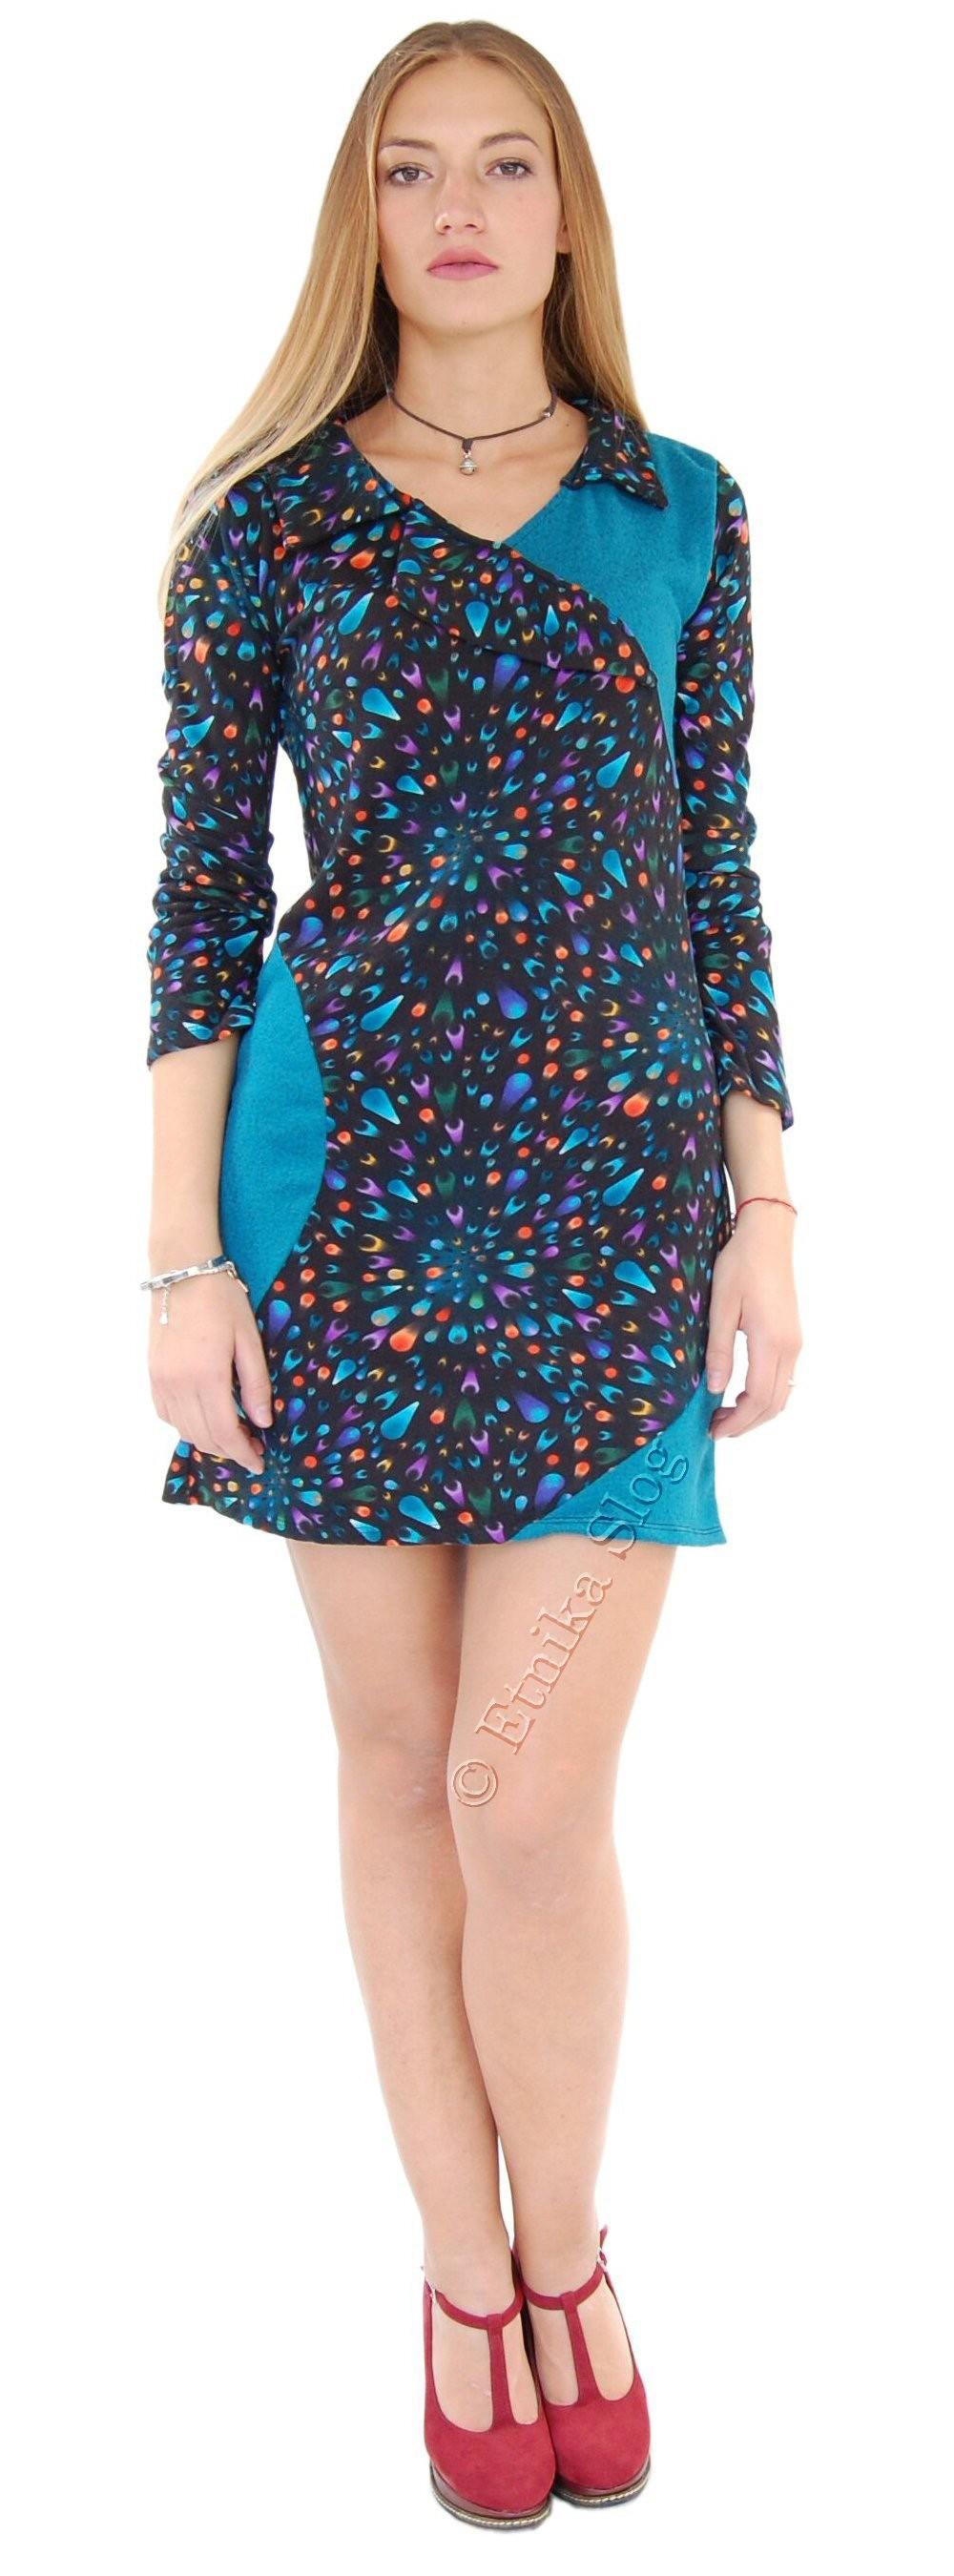 -20% DRESSES - LONG SLEEVES - AUTUMN/WINTER AB-MRS160AC - Oriente Import S.r.l.